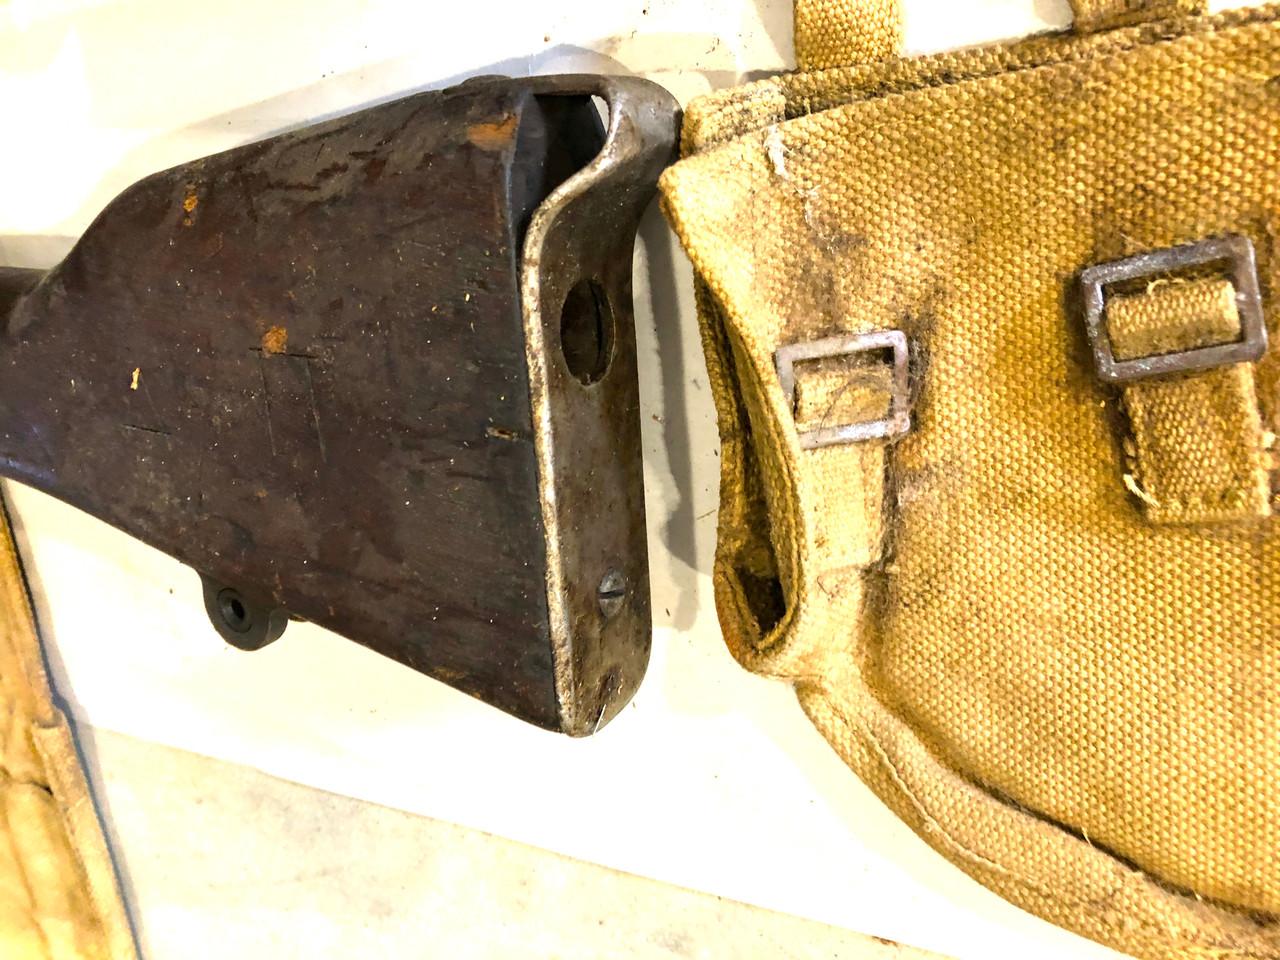 Lot 7: Mk2 BREN Receiver Center Section - Enfield 1942